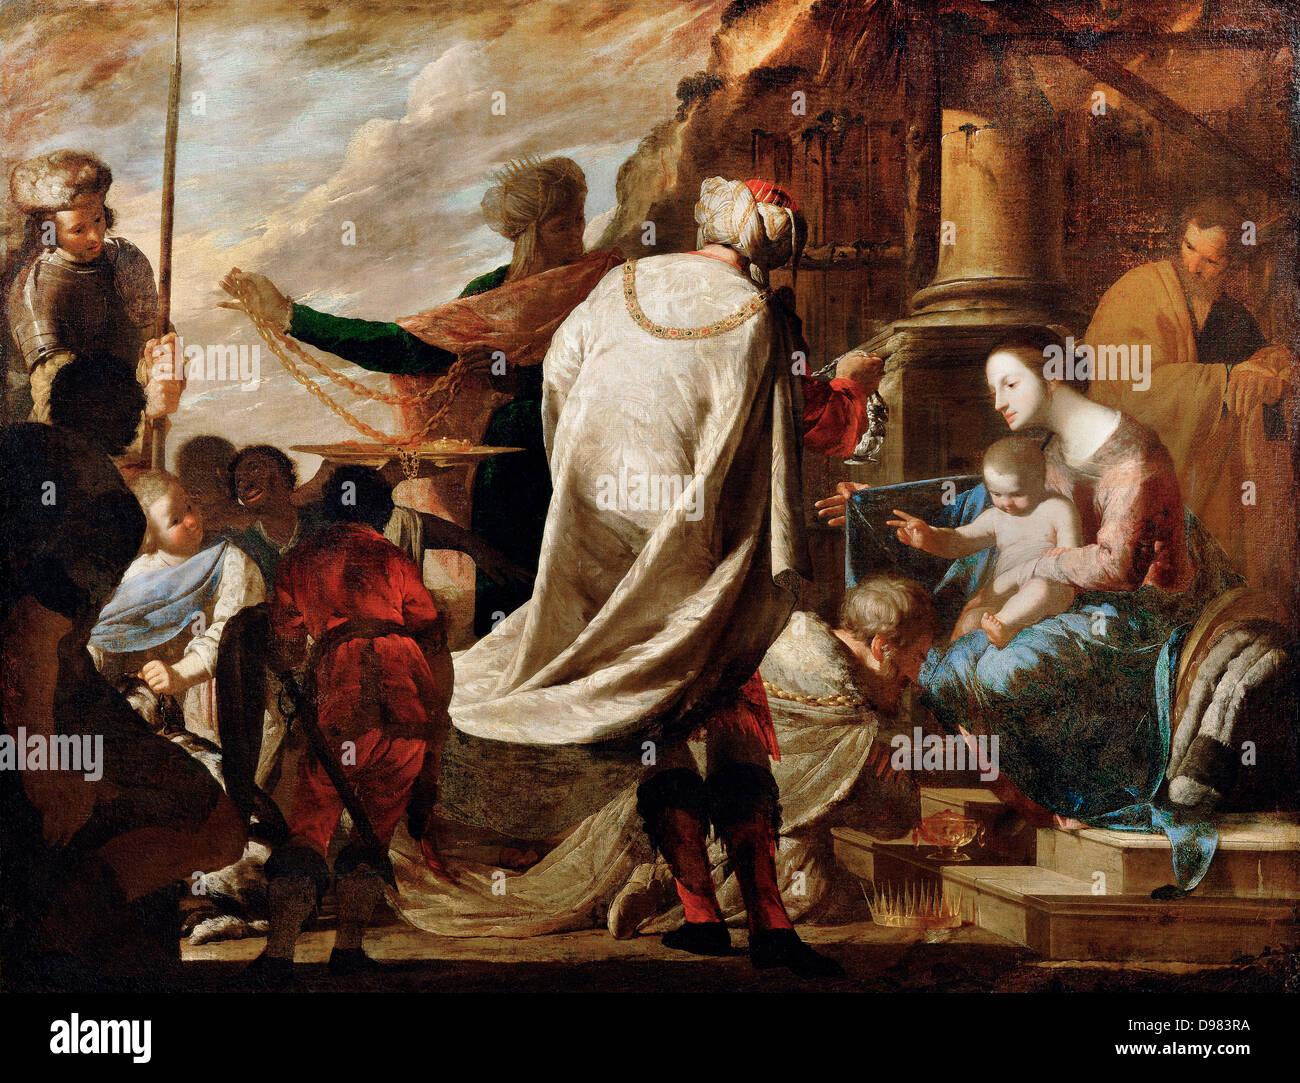 Bernardo Cavallino, Adoration of the Magi 1630 - 1656 Oil on canvas. Kunsthistorisches Museum, Vienna, Austria. - Stock Image